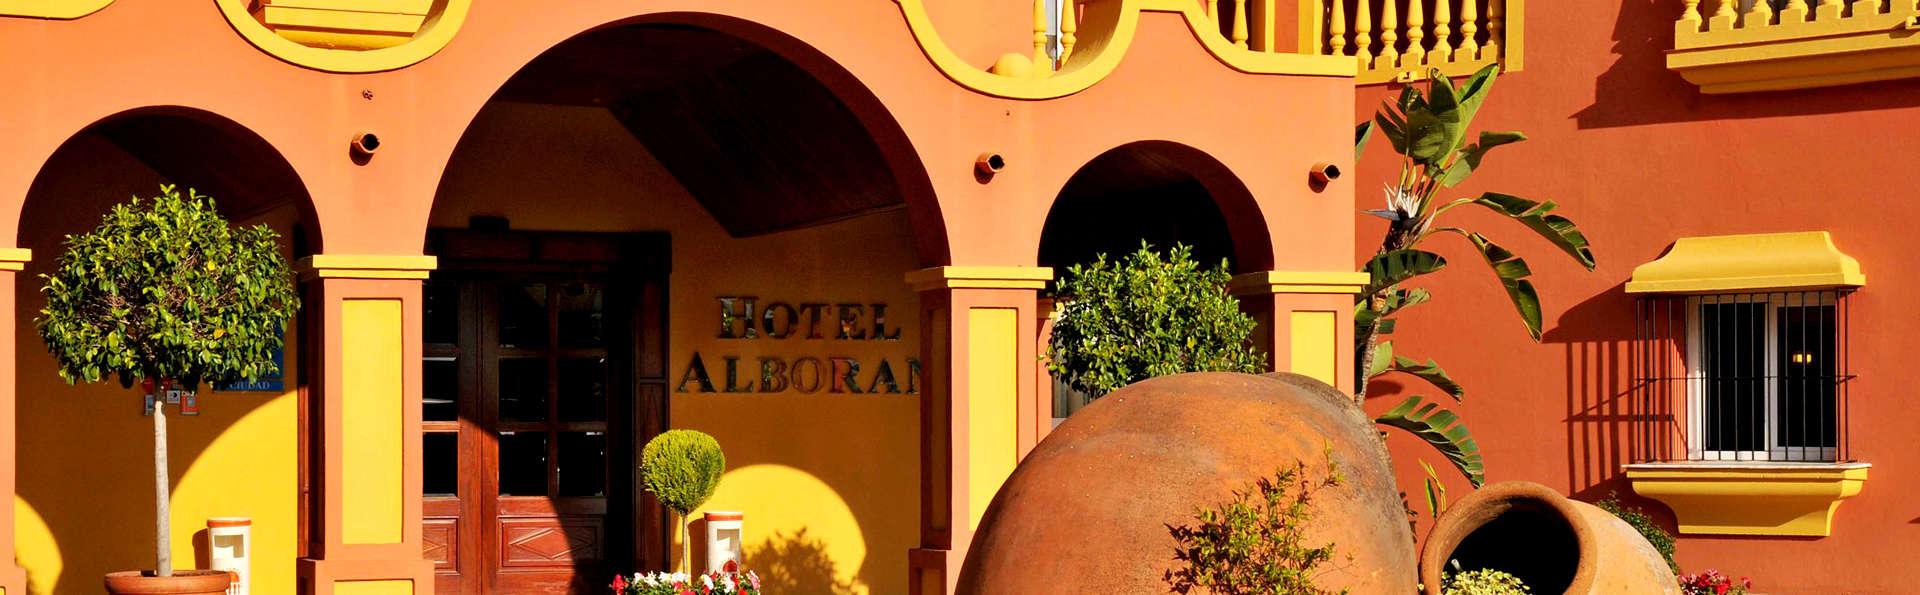 Hotel Alborán Chiclana - Edit_Front2.jpg